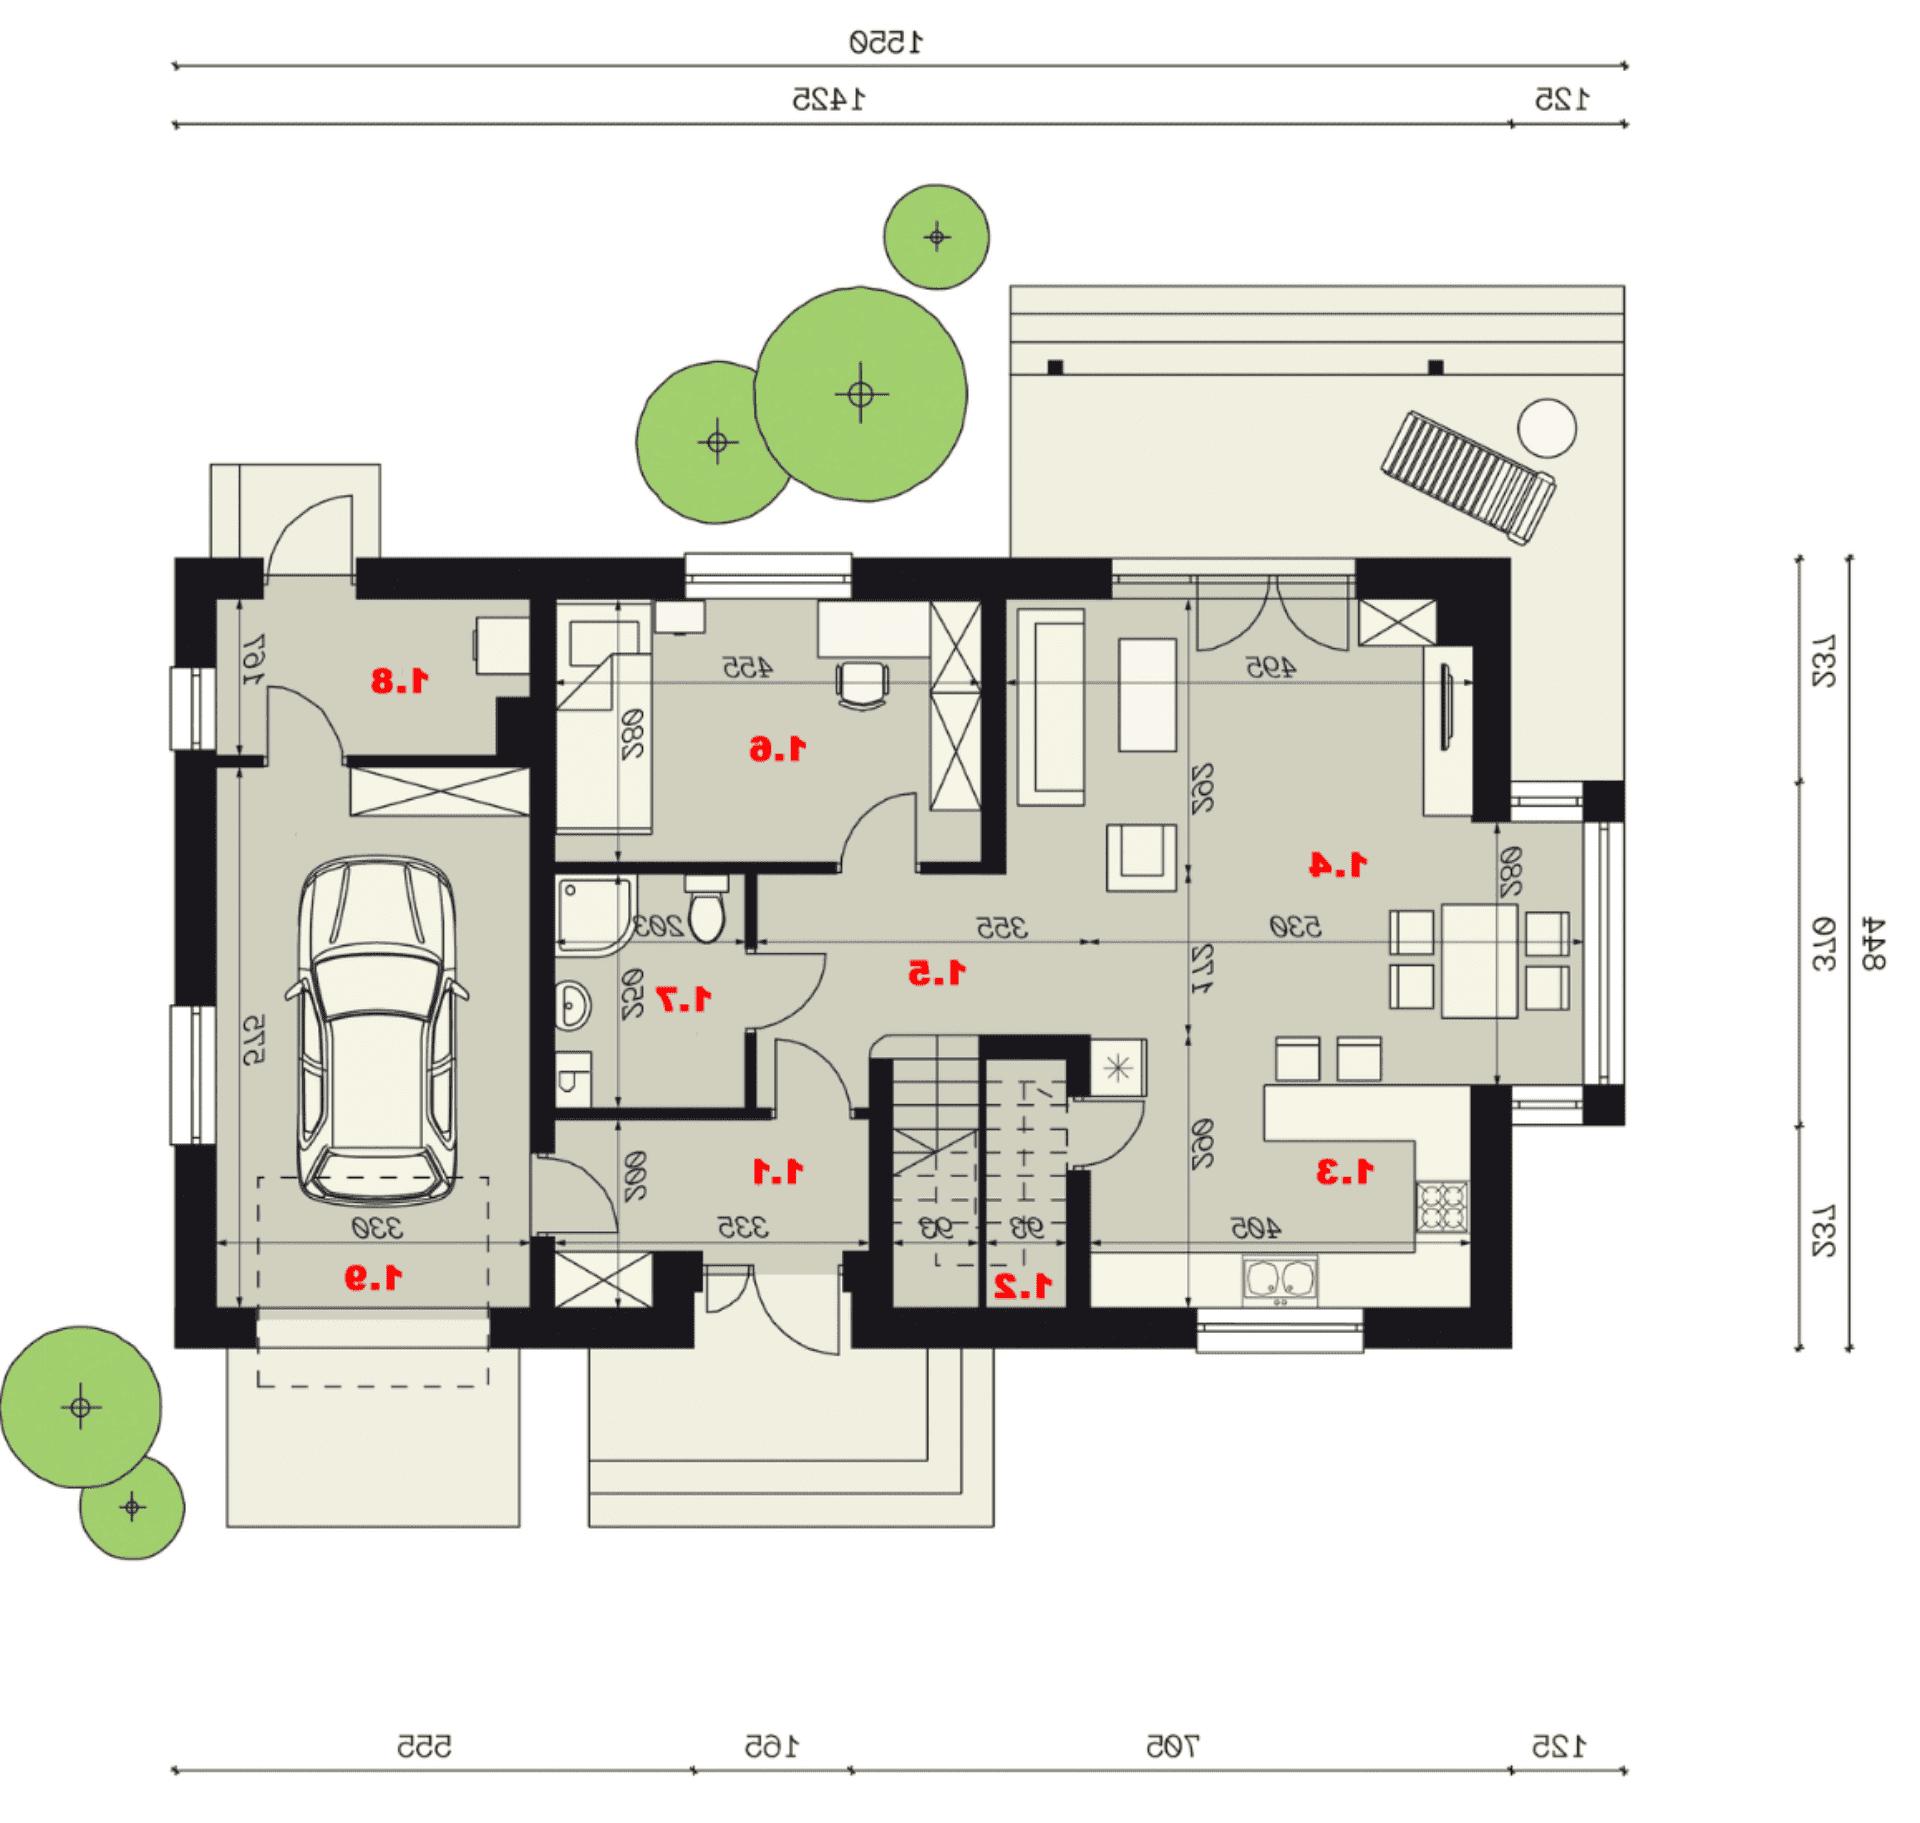 Rzut parteru - projekt domu SEJ-PRO 003 ENERGO - odbicie lustrzane